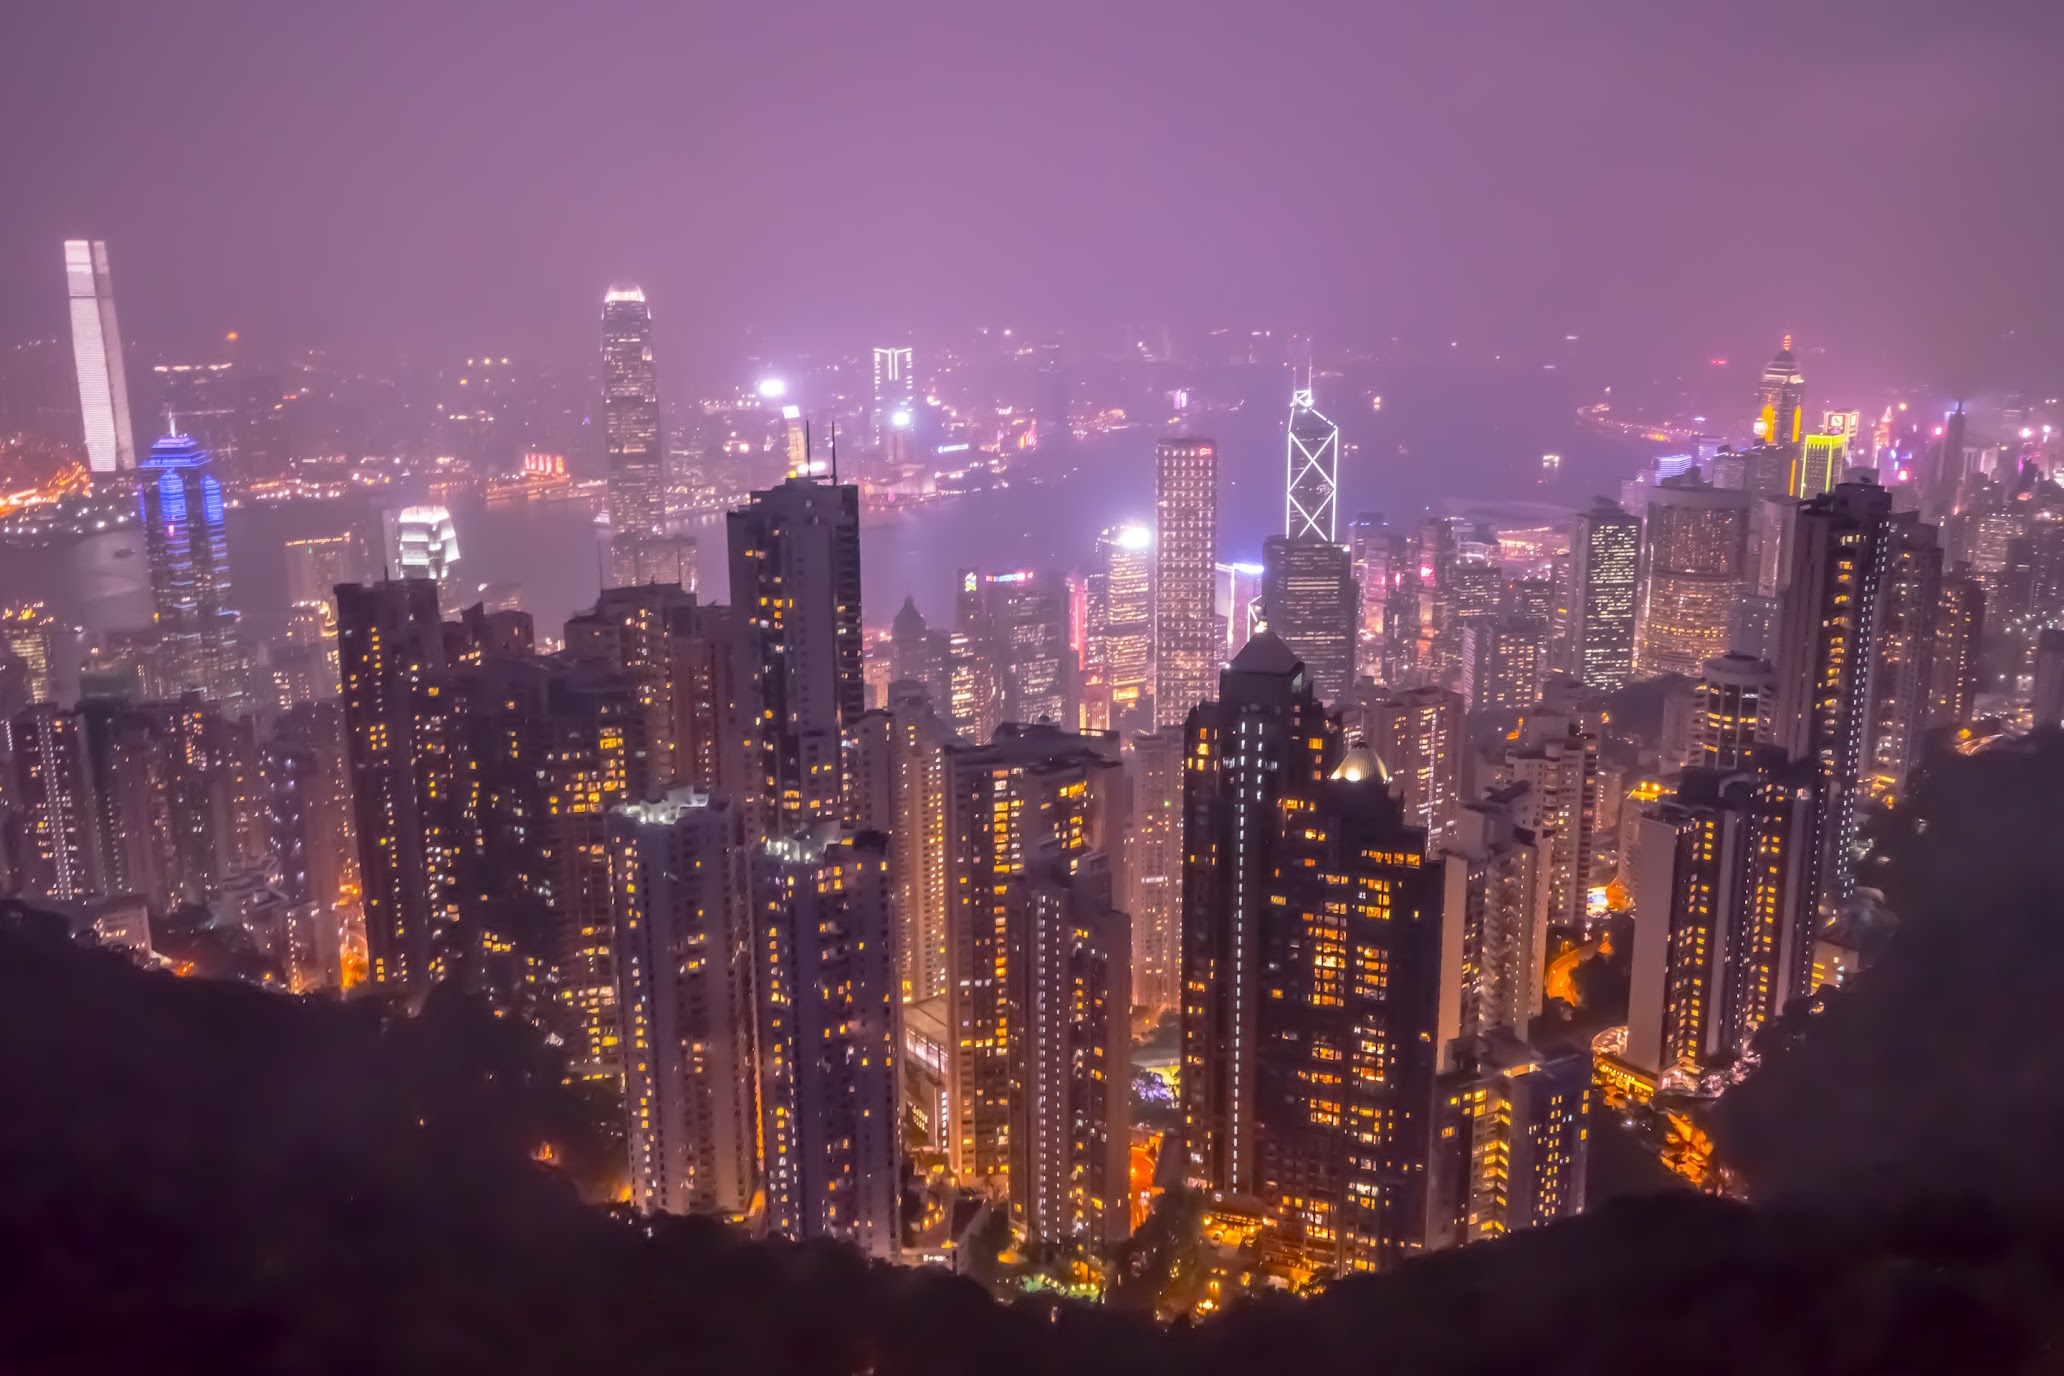 Hong Kong Peak Tower evening view